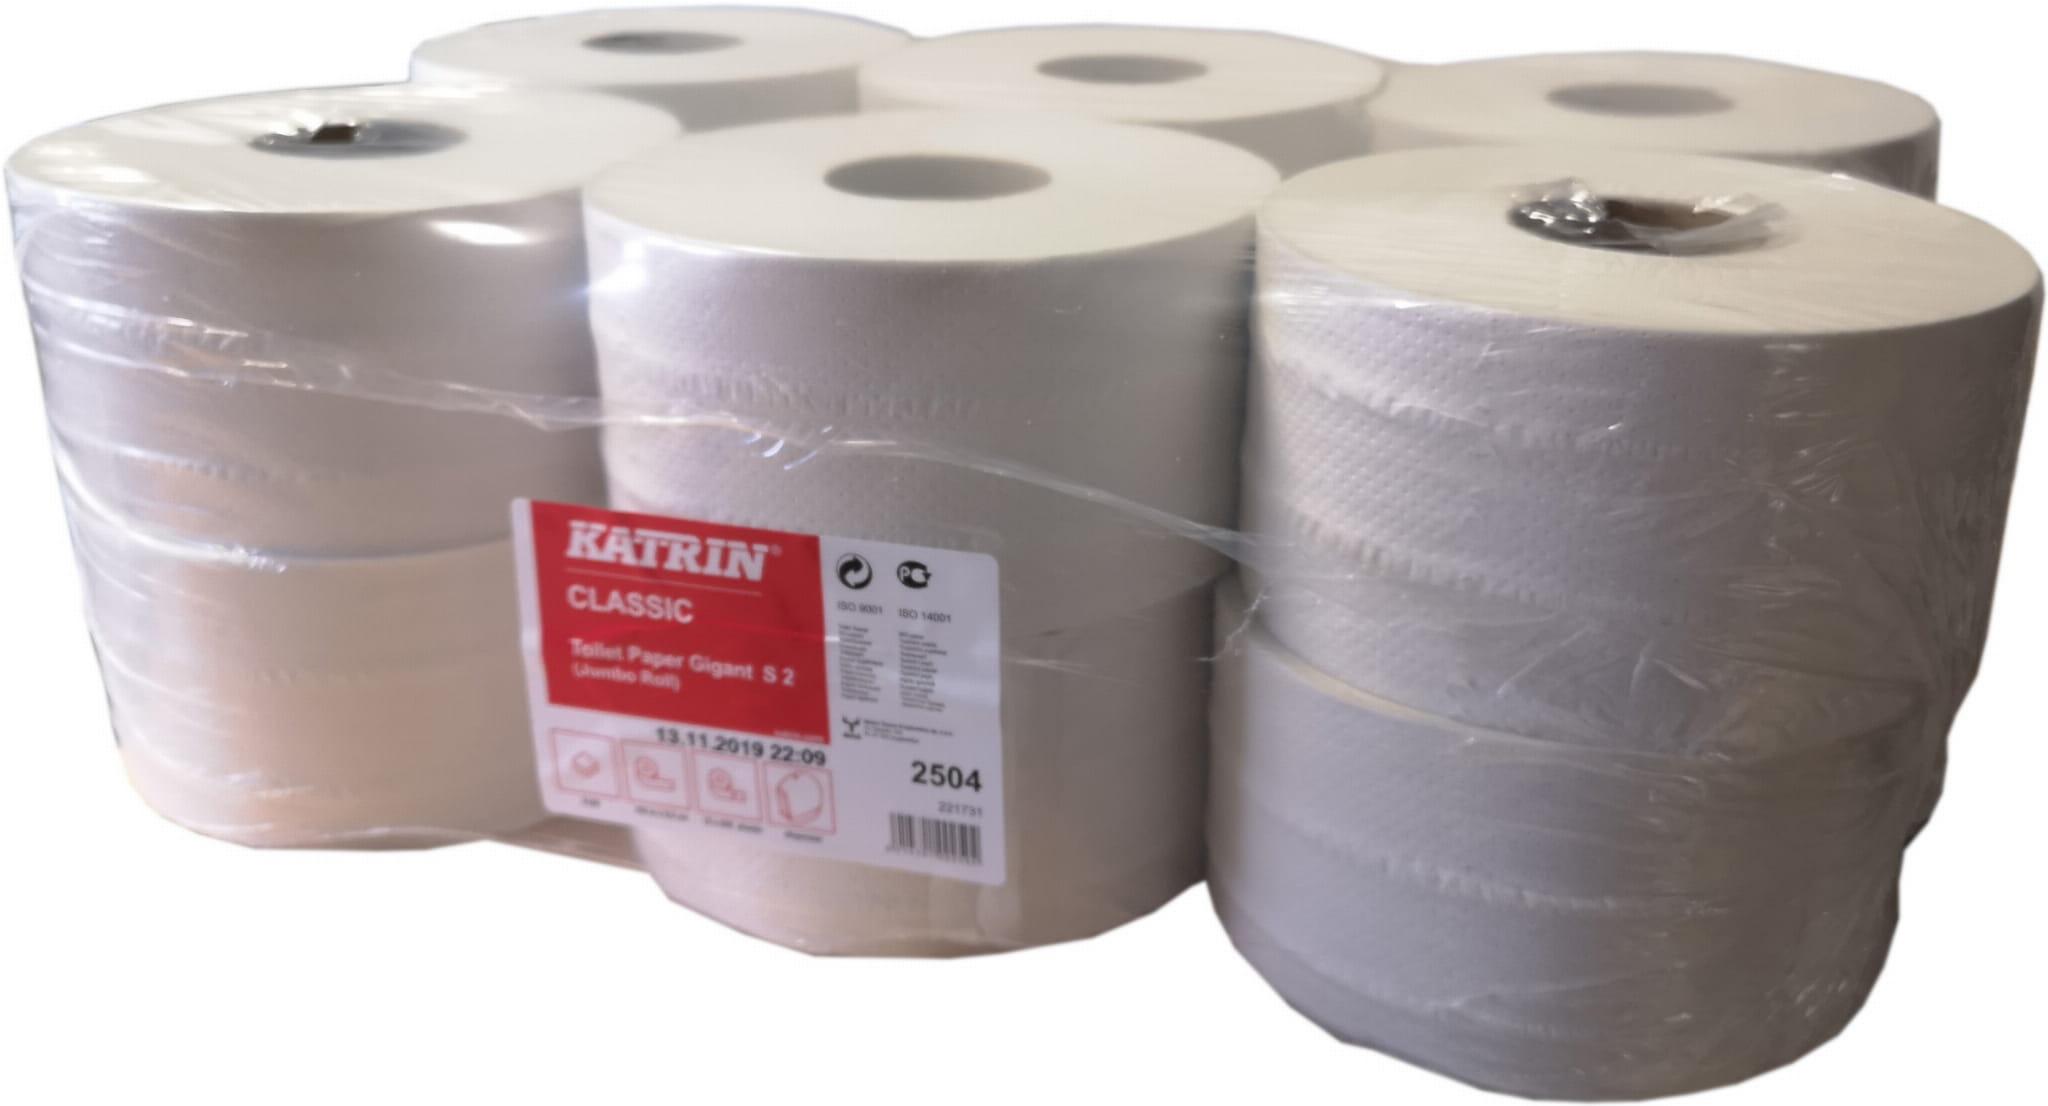 Papier toaletowy Katrin Classic Gigant Toilet S2 - 12 rolek  -  2504